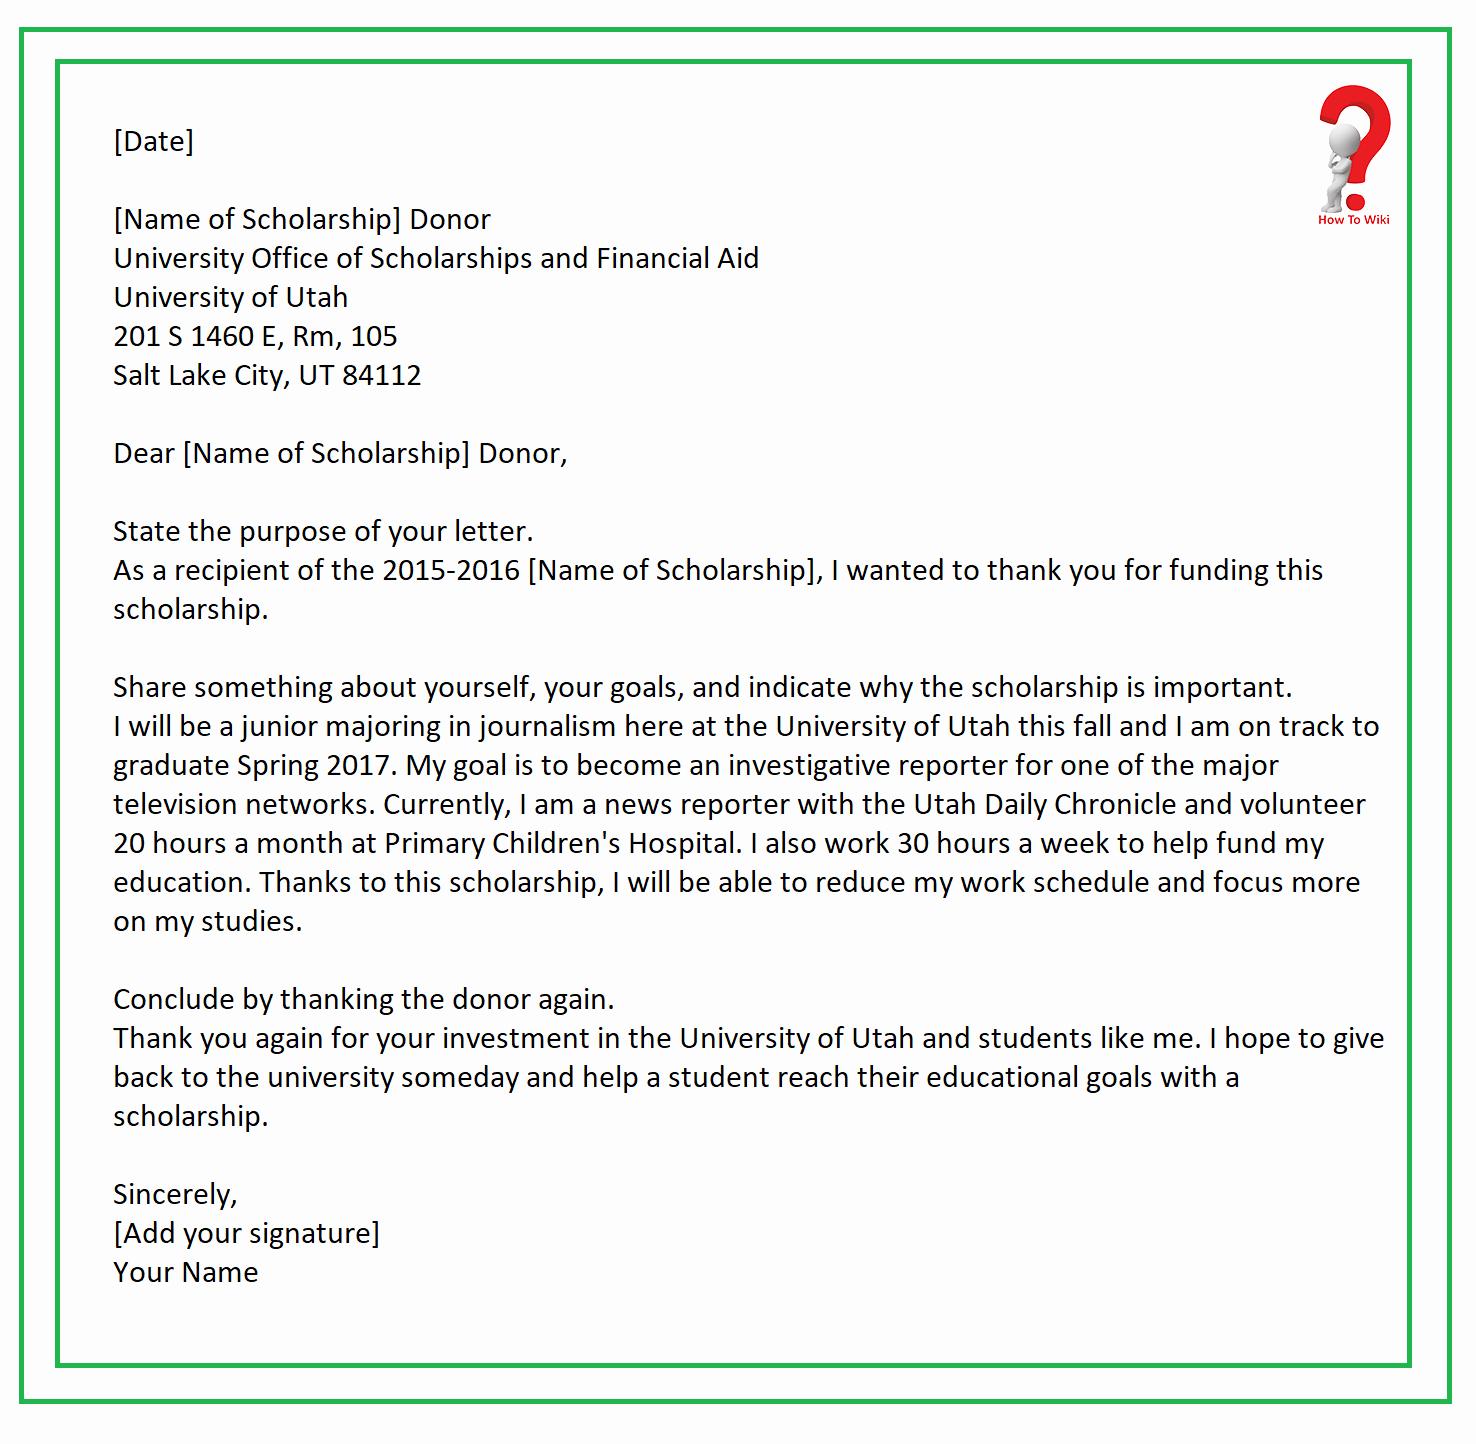 Scholarship Thank You Letter Template Elegant How to Write Thank You Letter for Scholarship